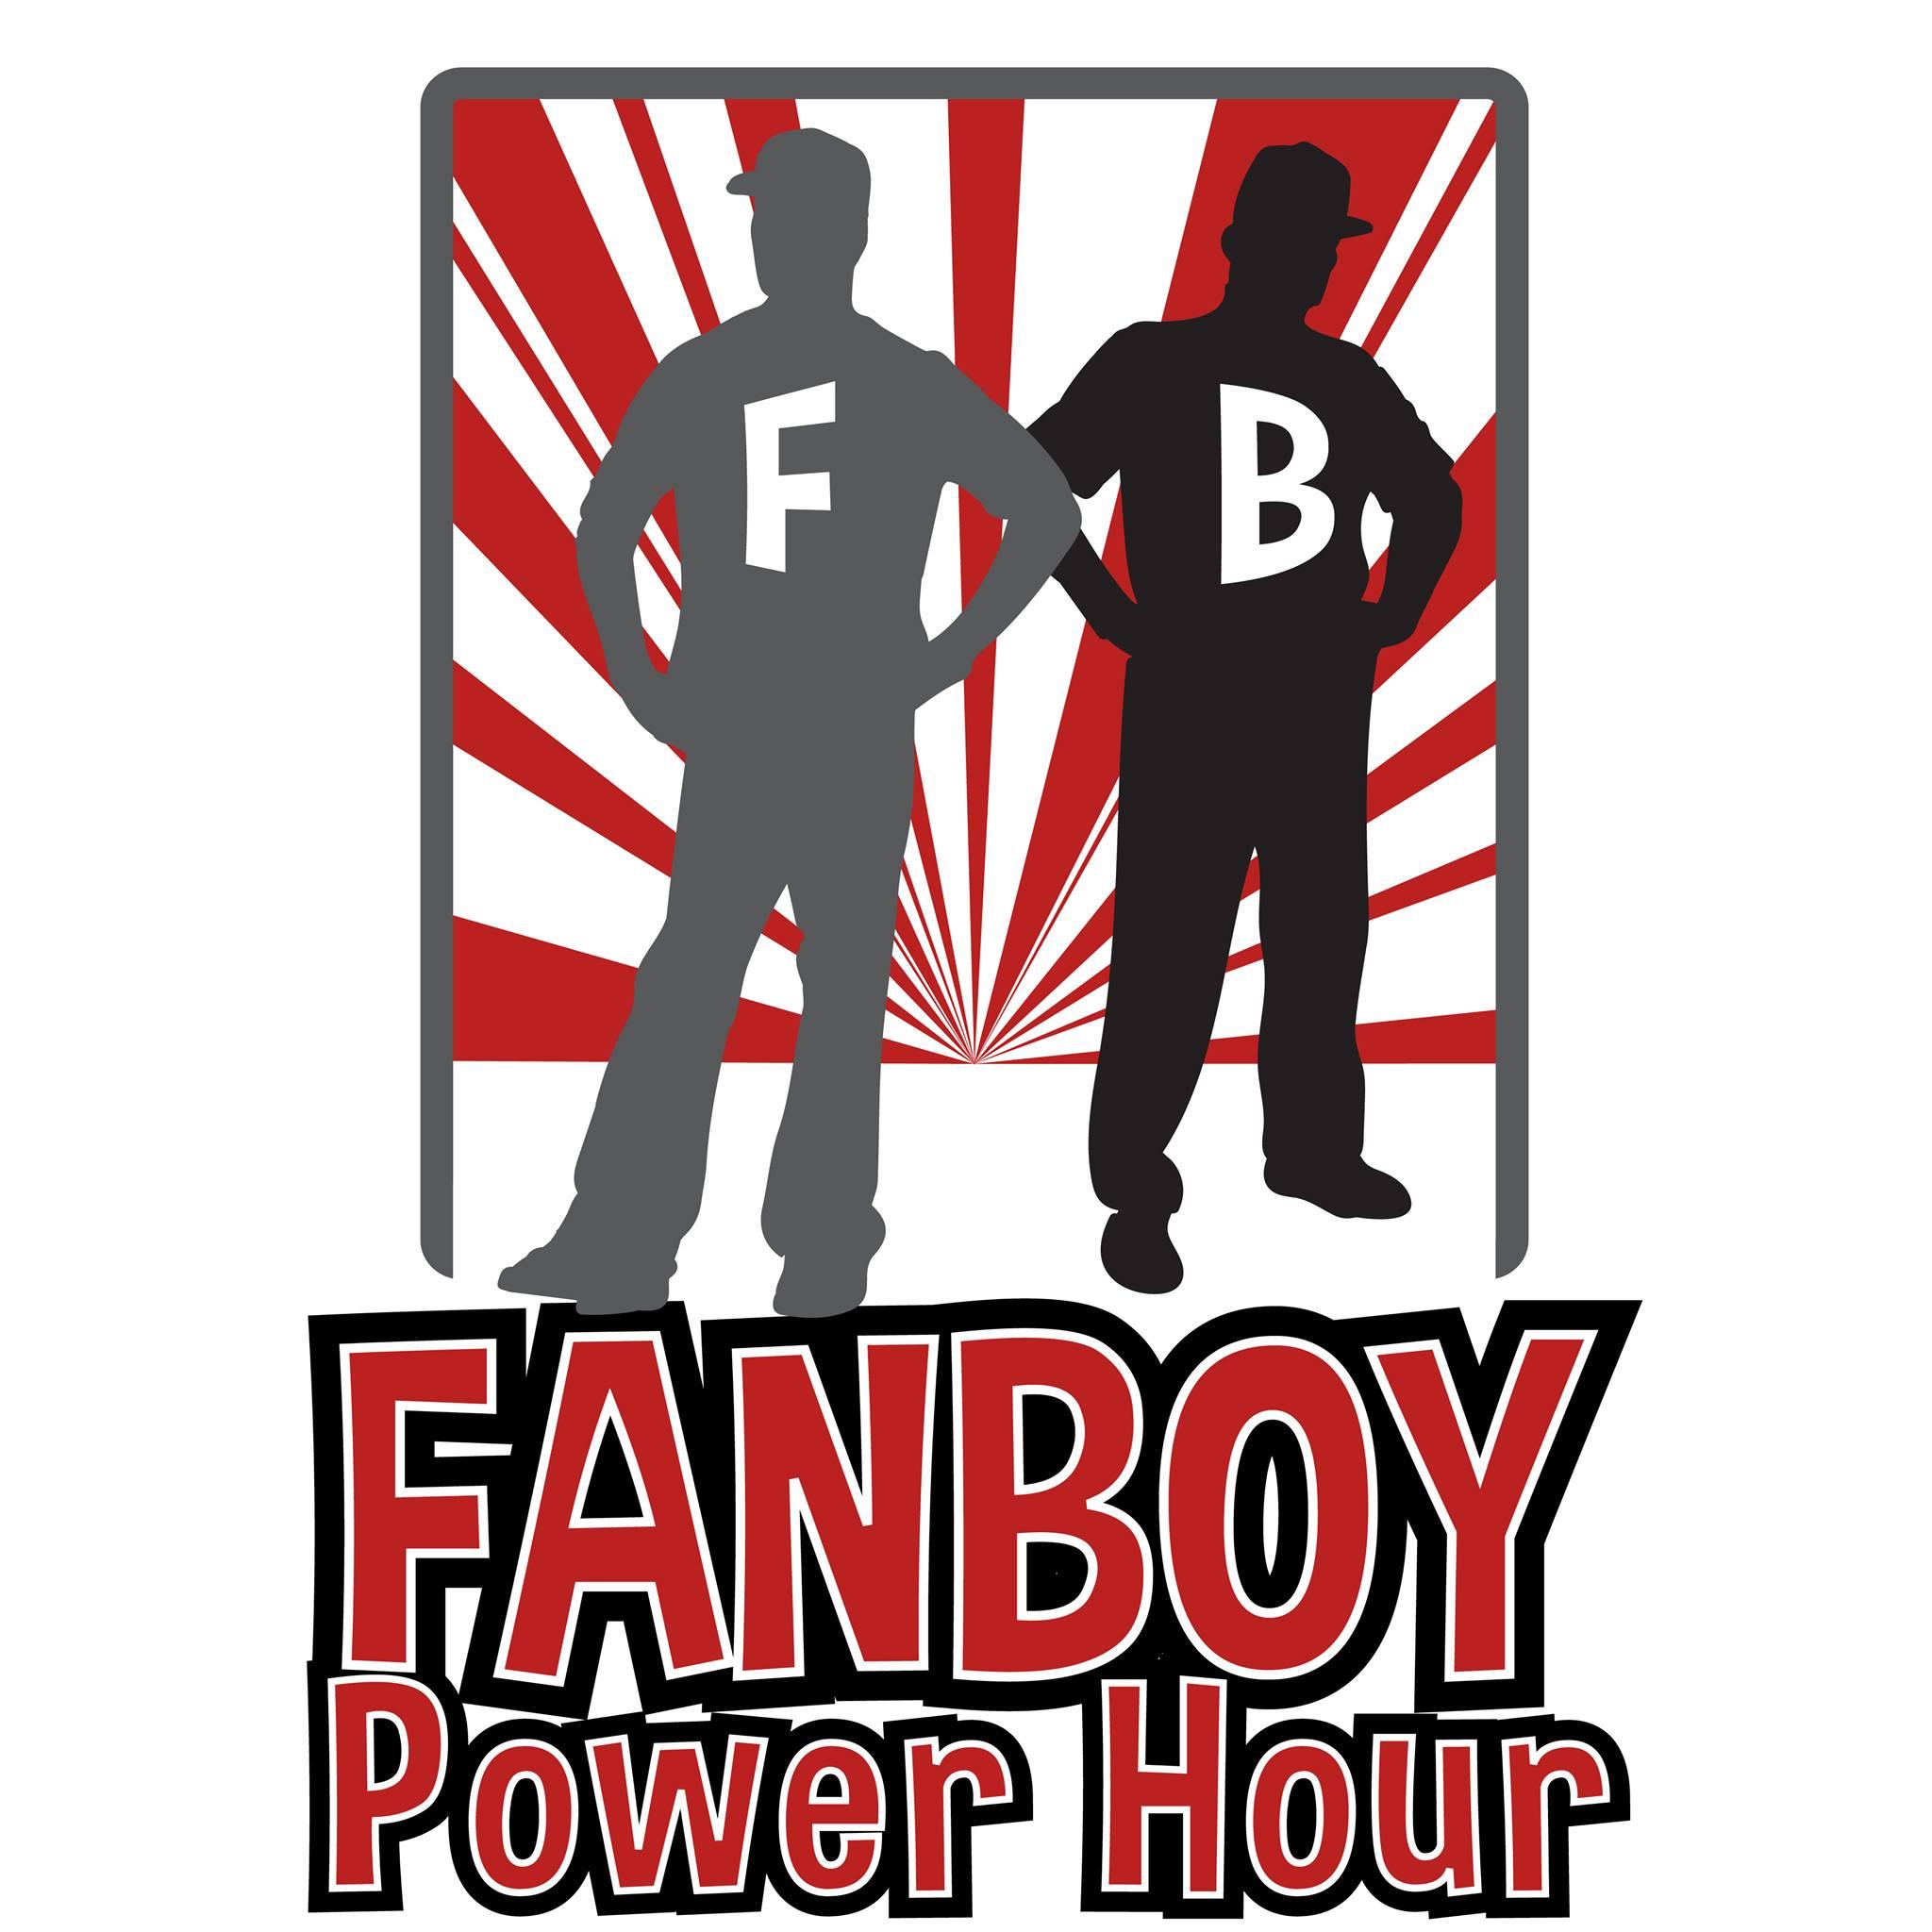 The Fanboy Power Hour show art